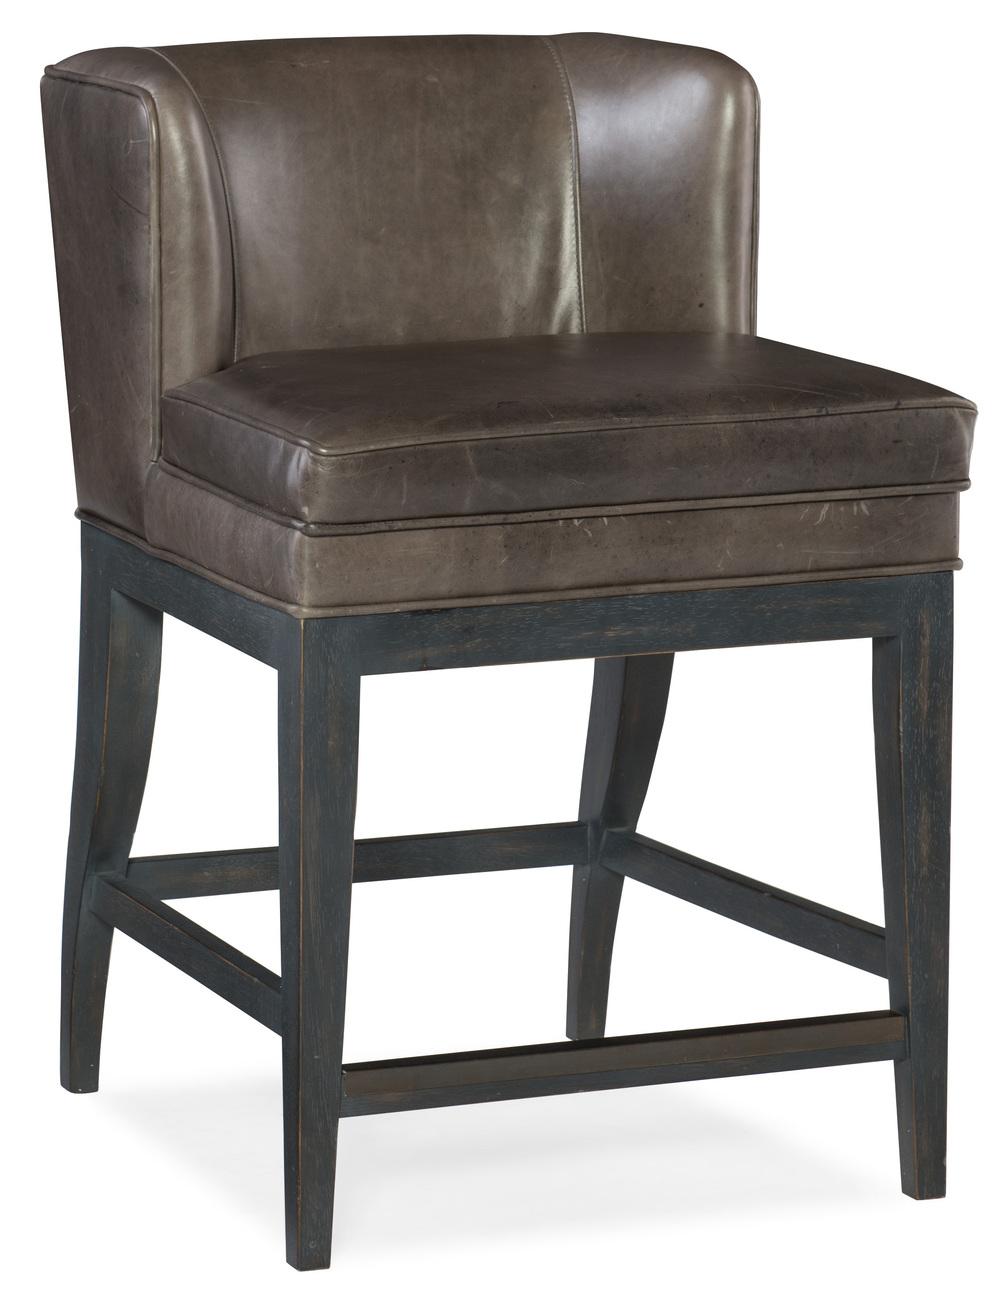 Hooker Furniture - Sangria Counter Stool